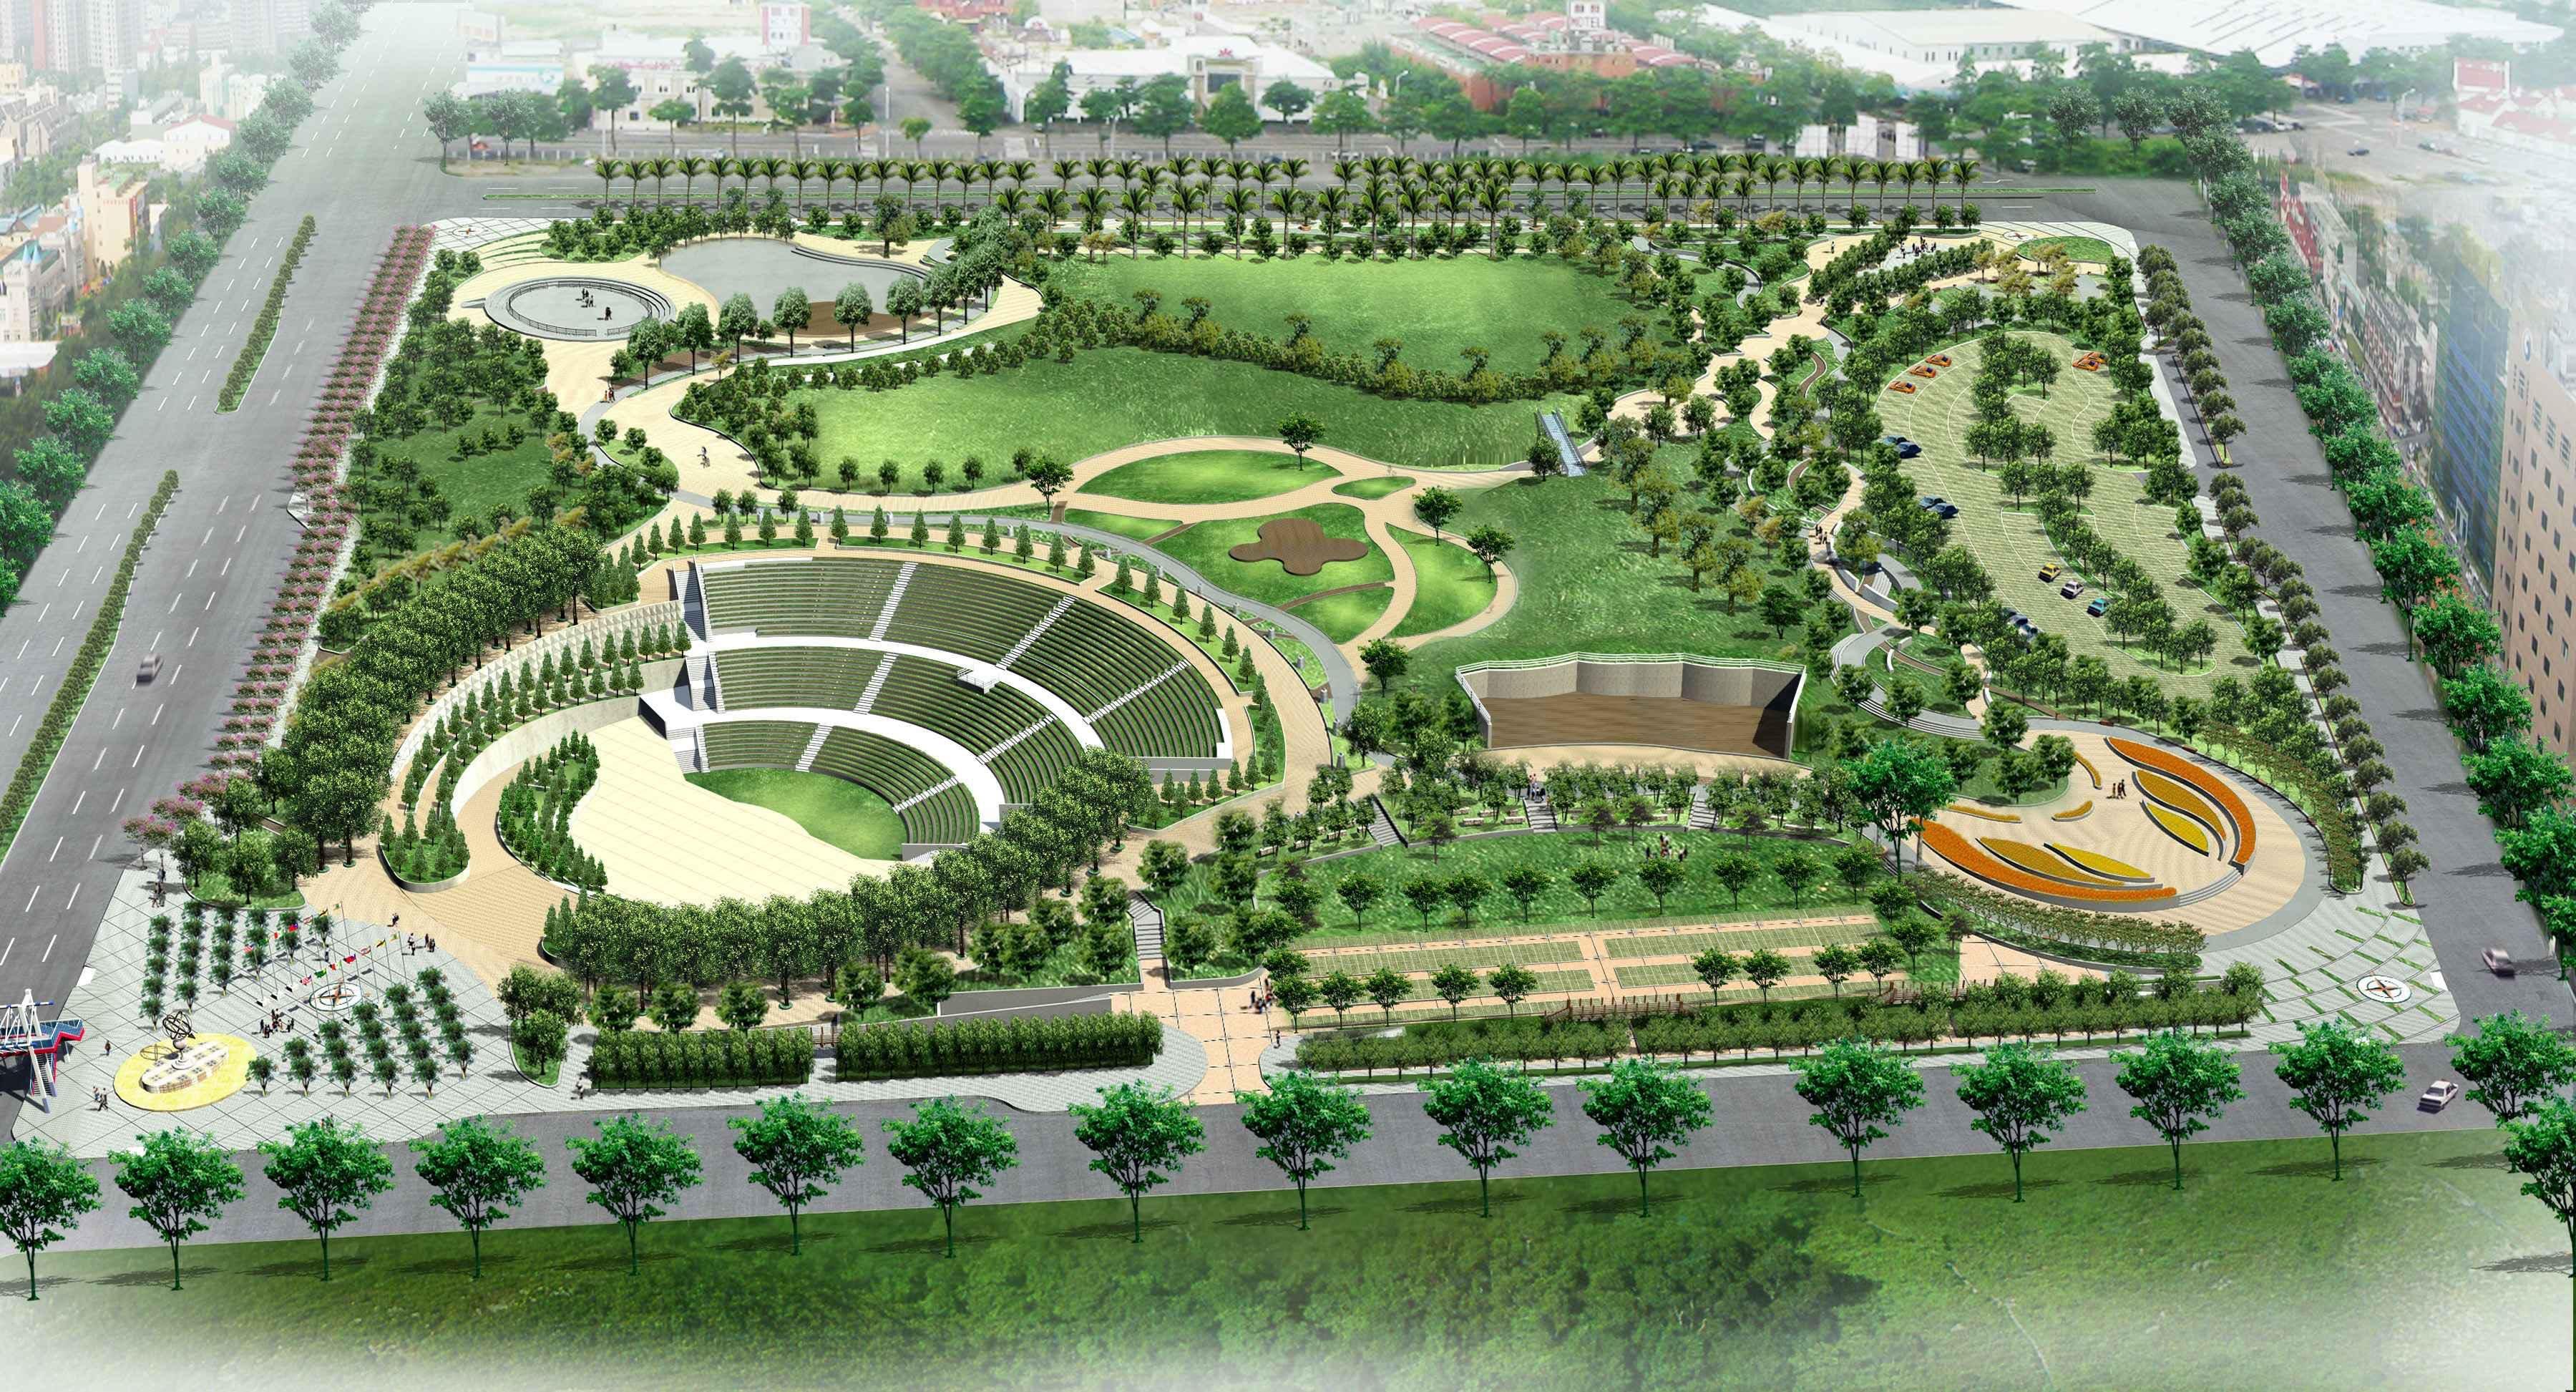 outdoor amphitheater Google Search Landscape architect